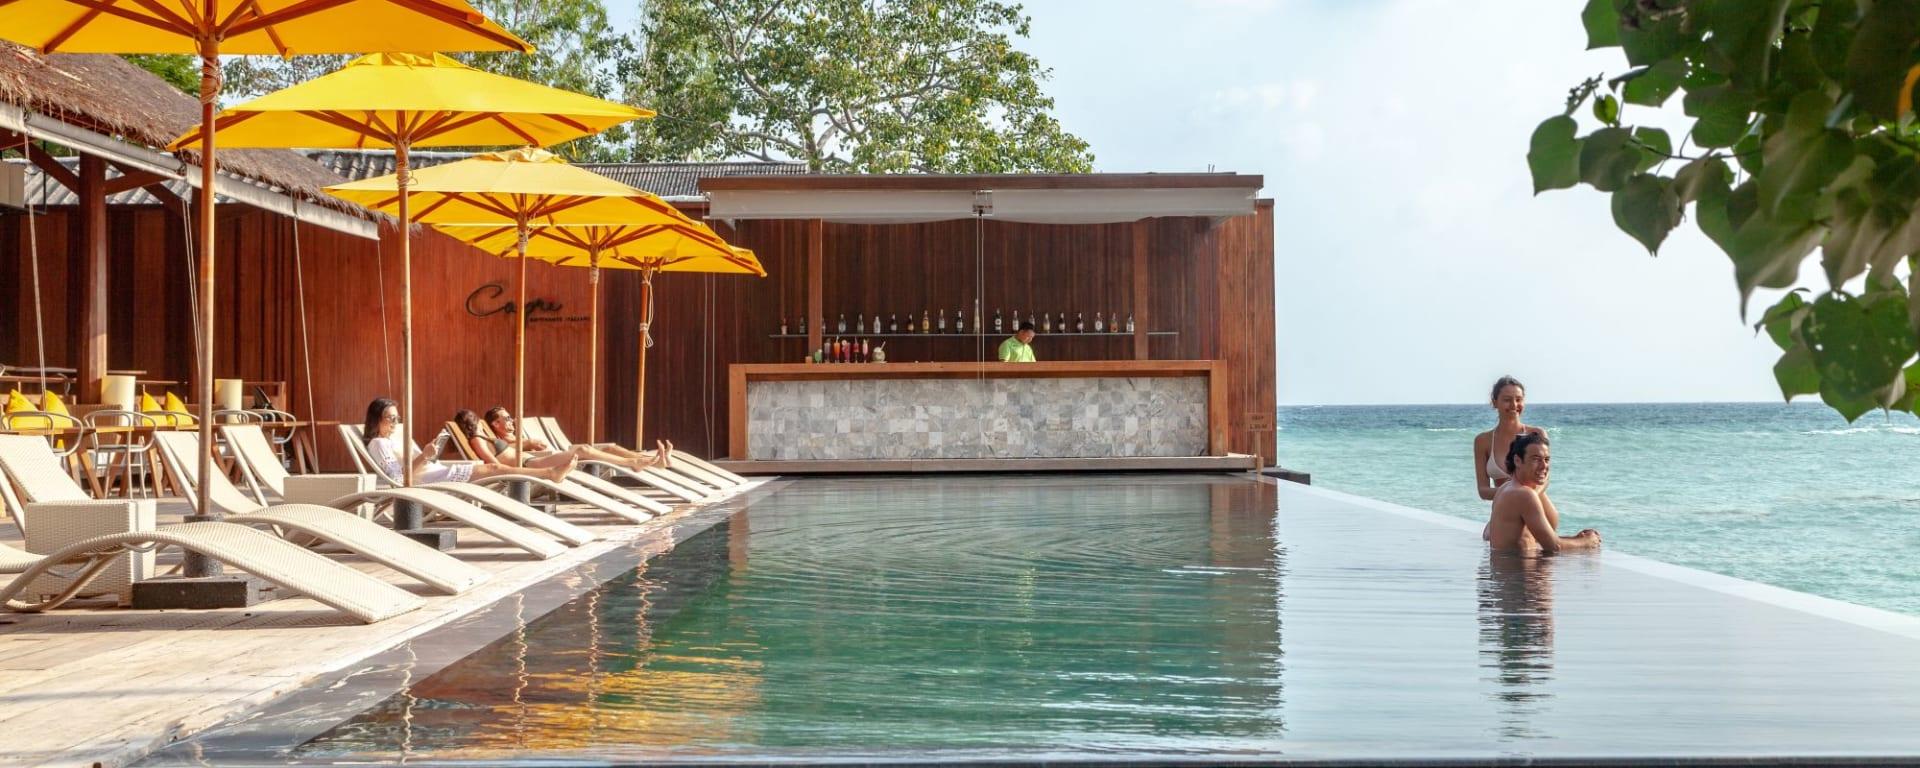 The Beach Club by Haadtien in Ko Tao: Pool